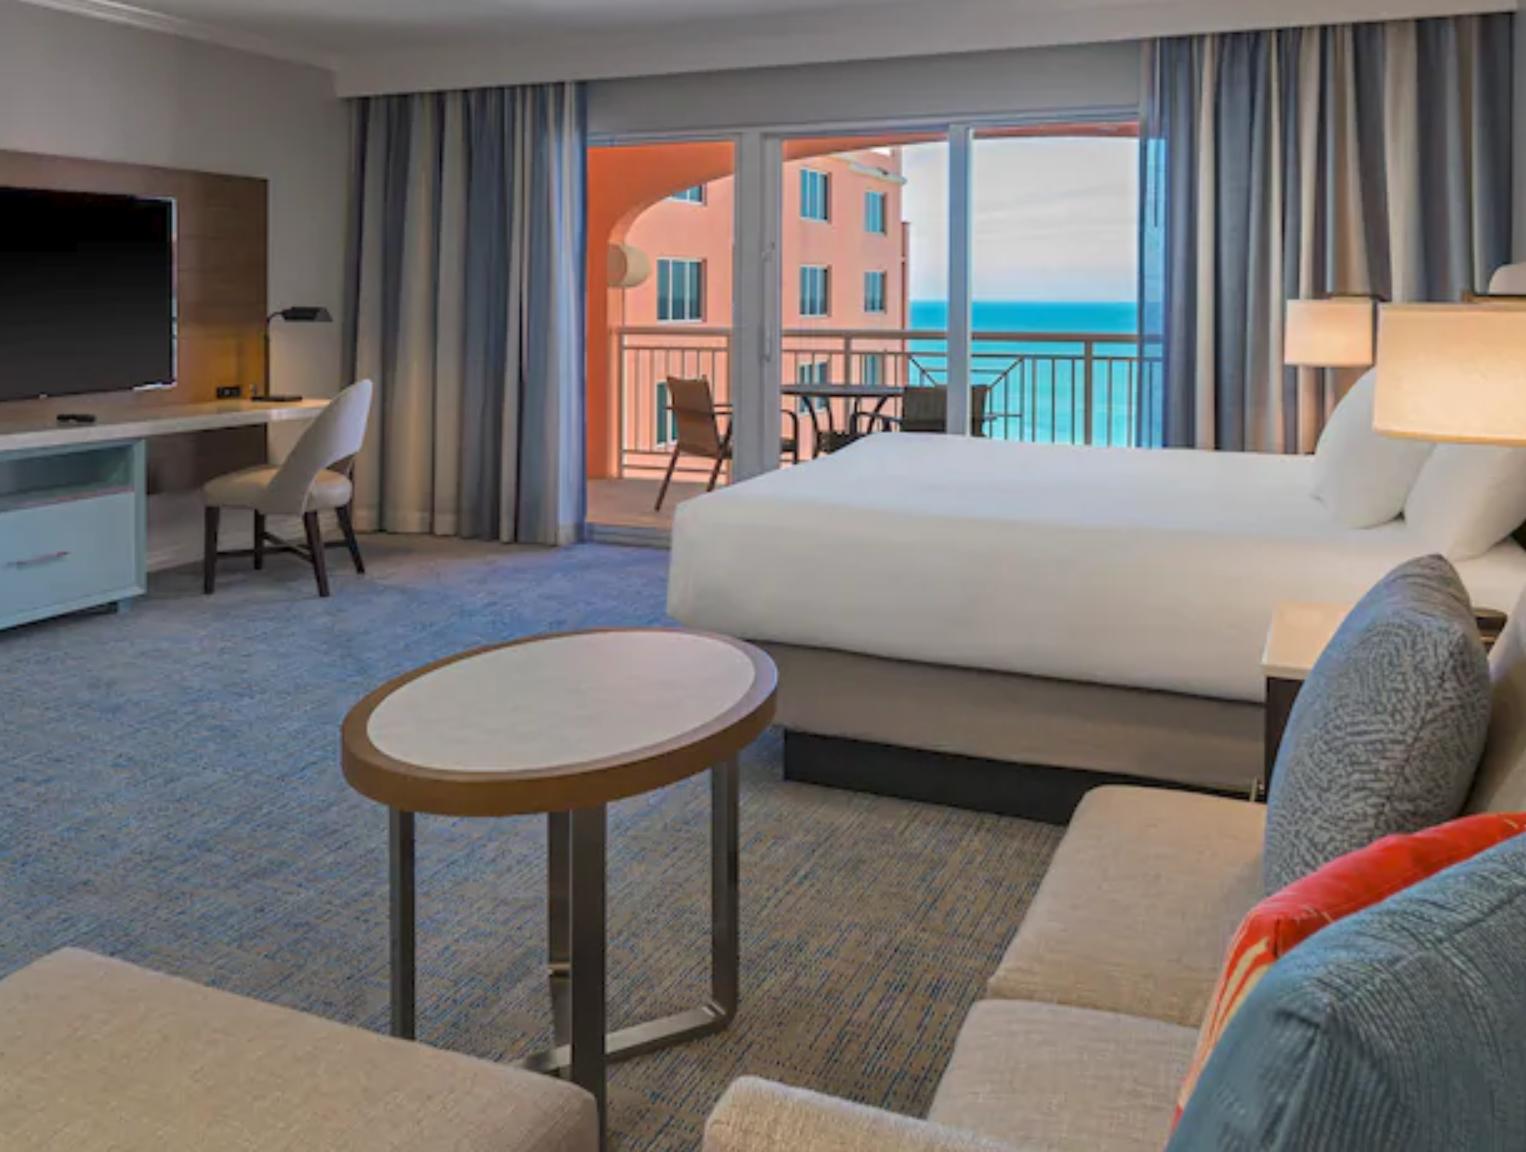 https://www.hotelsbyday.com/_data/default-hotel_image/4/20476/screenshot-2020-08-13-at-12-49-23-pm.png